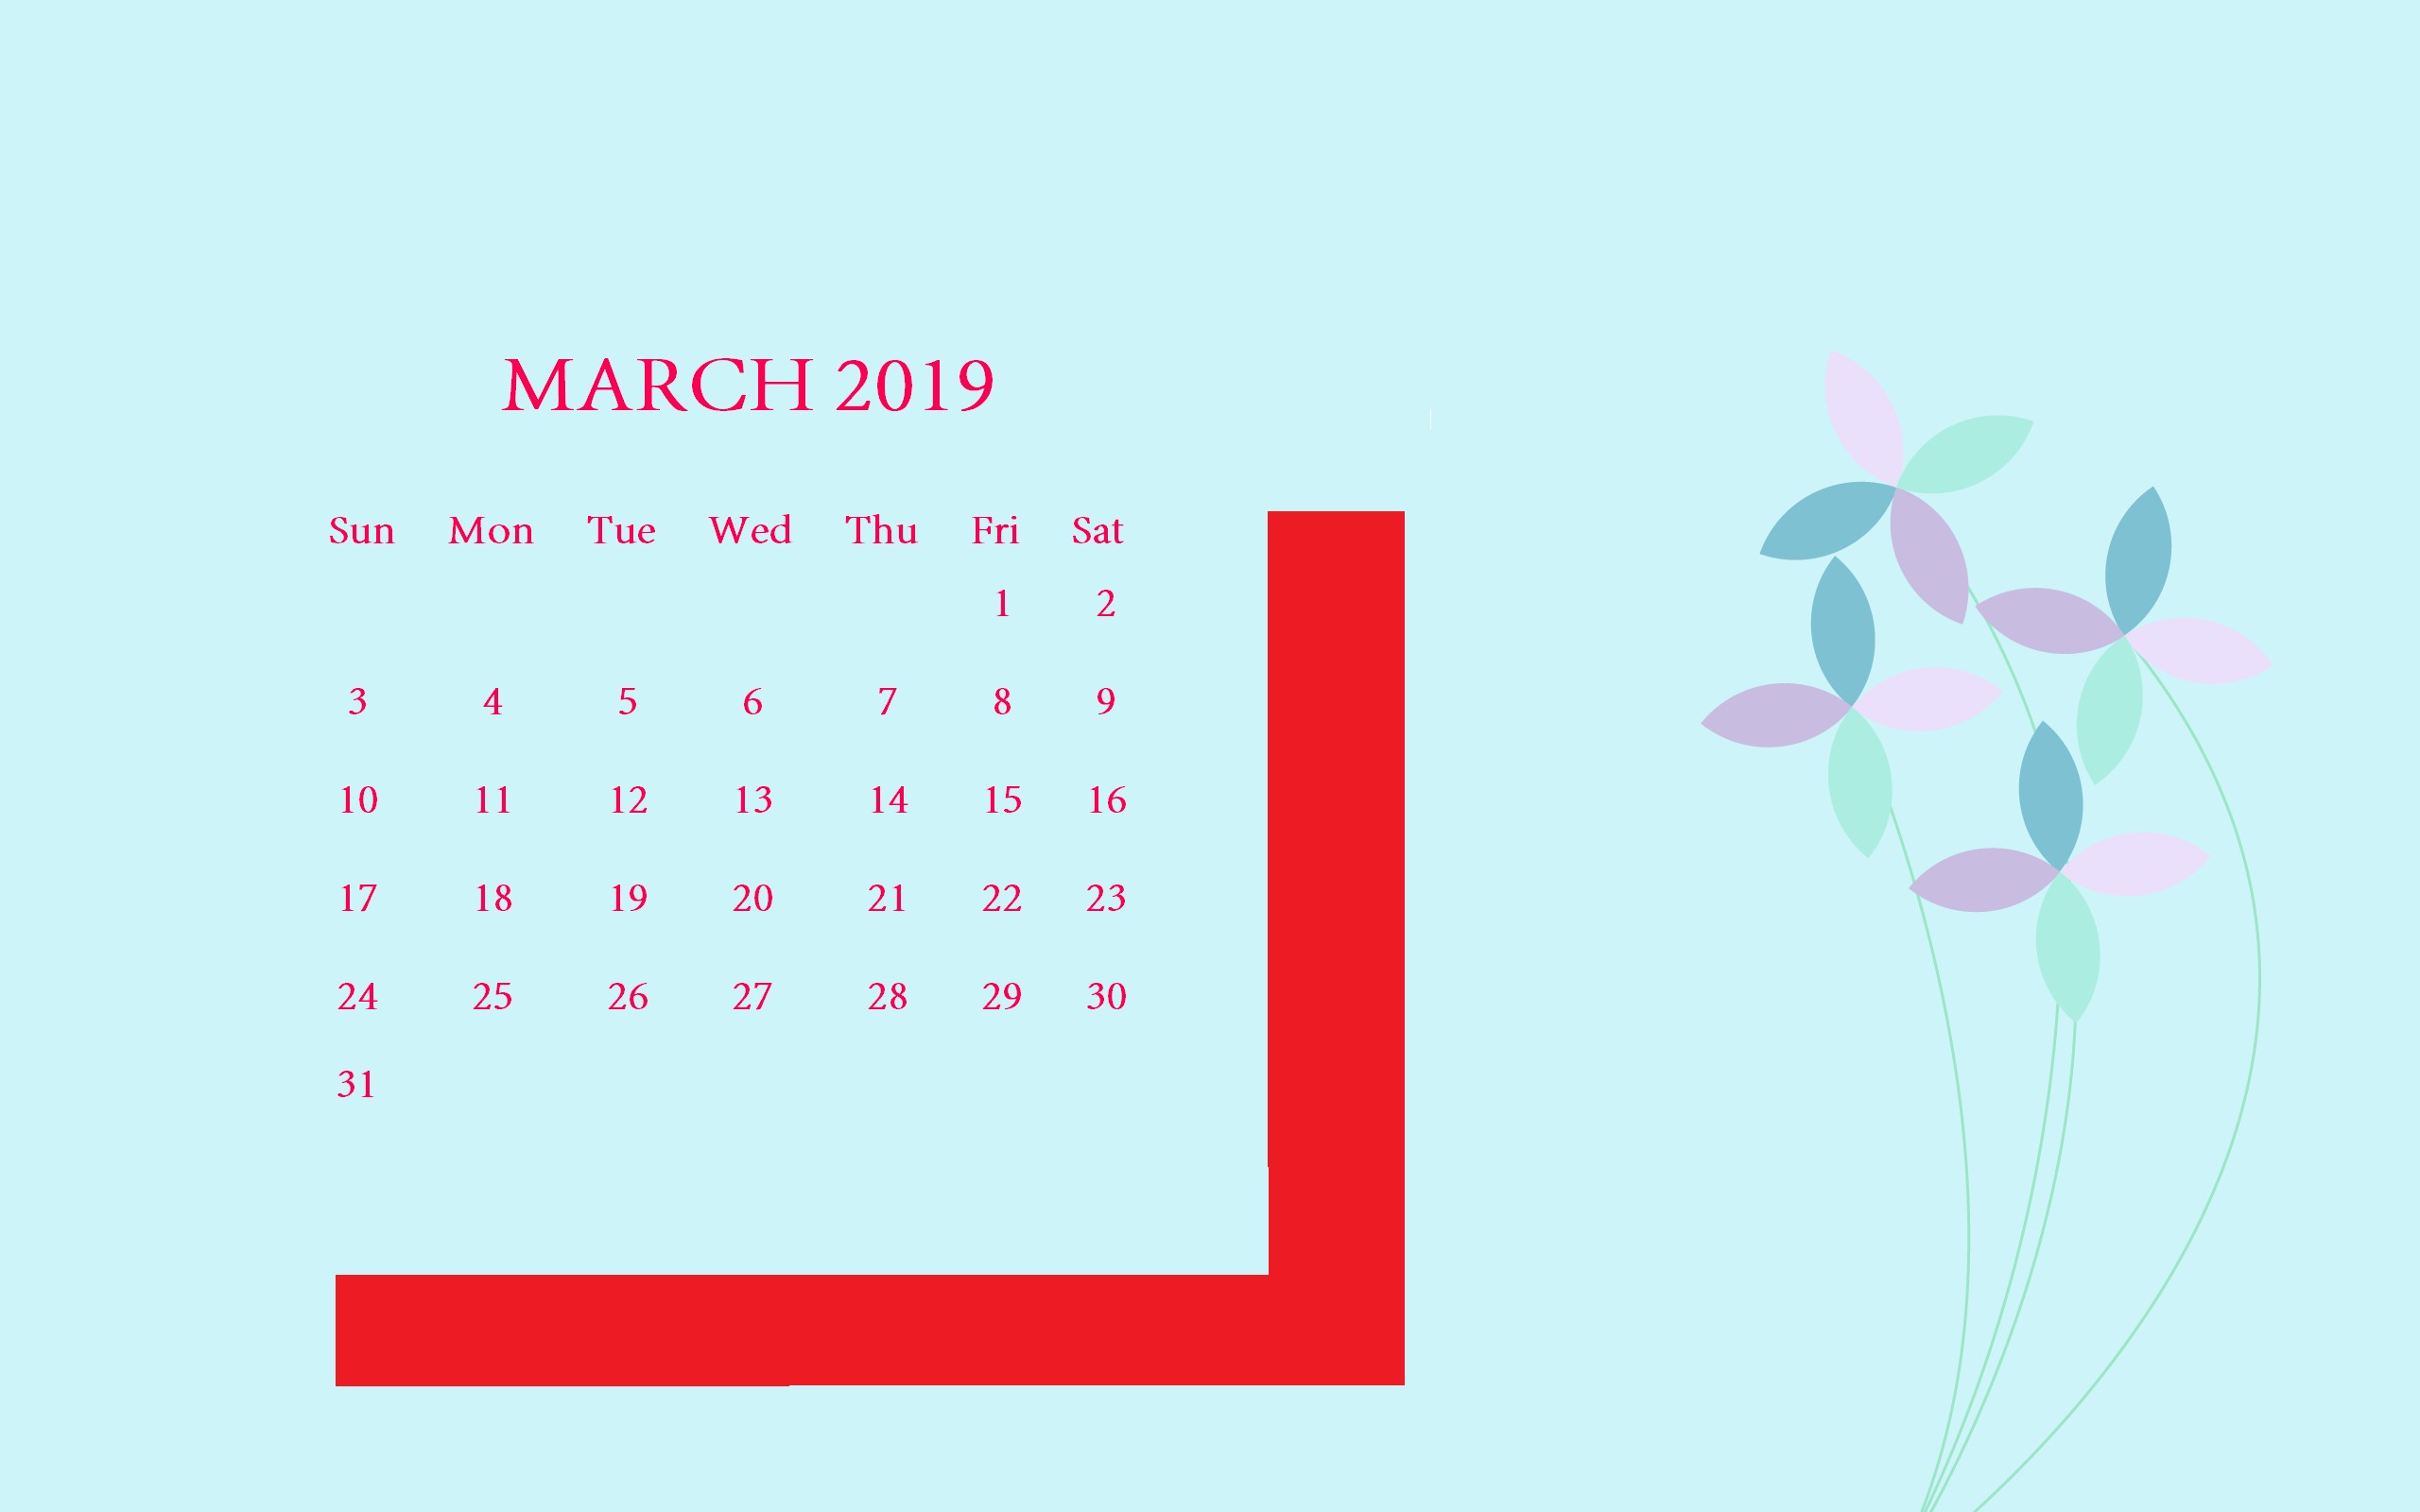 March Calendar Canada Más Recientes Flowers March 2019 Desktop Calendar March March2019 Of March Calendar Canada Más Arriba-a-fecha Kalender Ausdrucken 2015 Schön Printable 0d Calendars Kalender